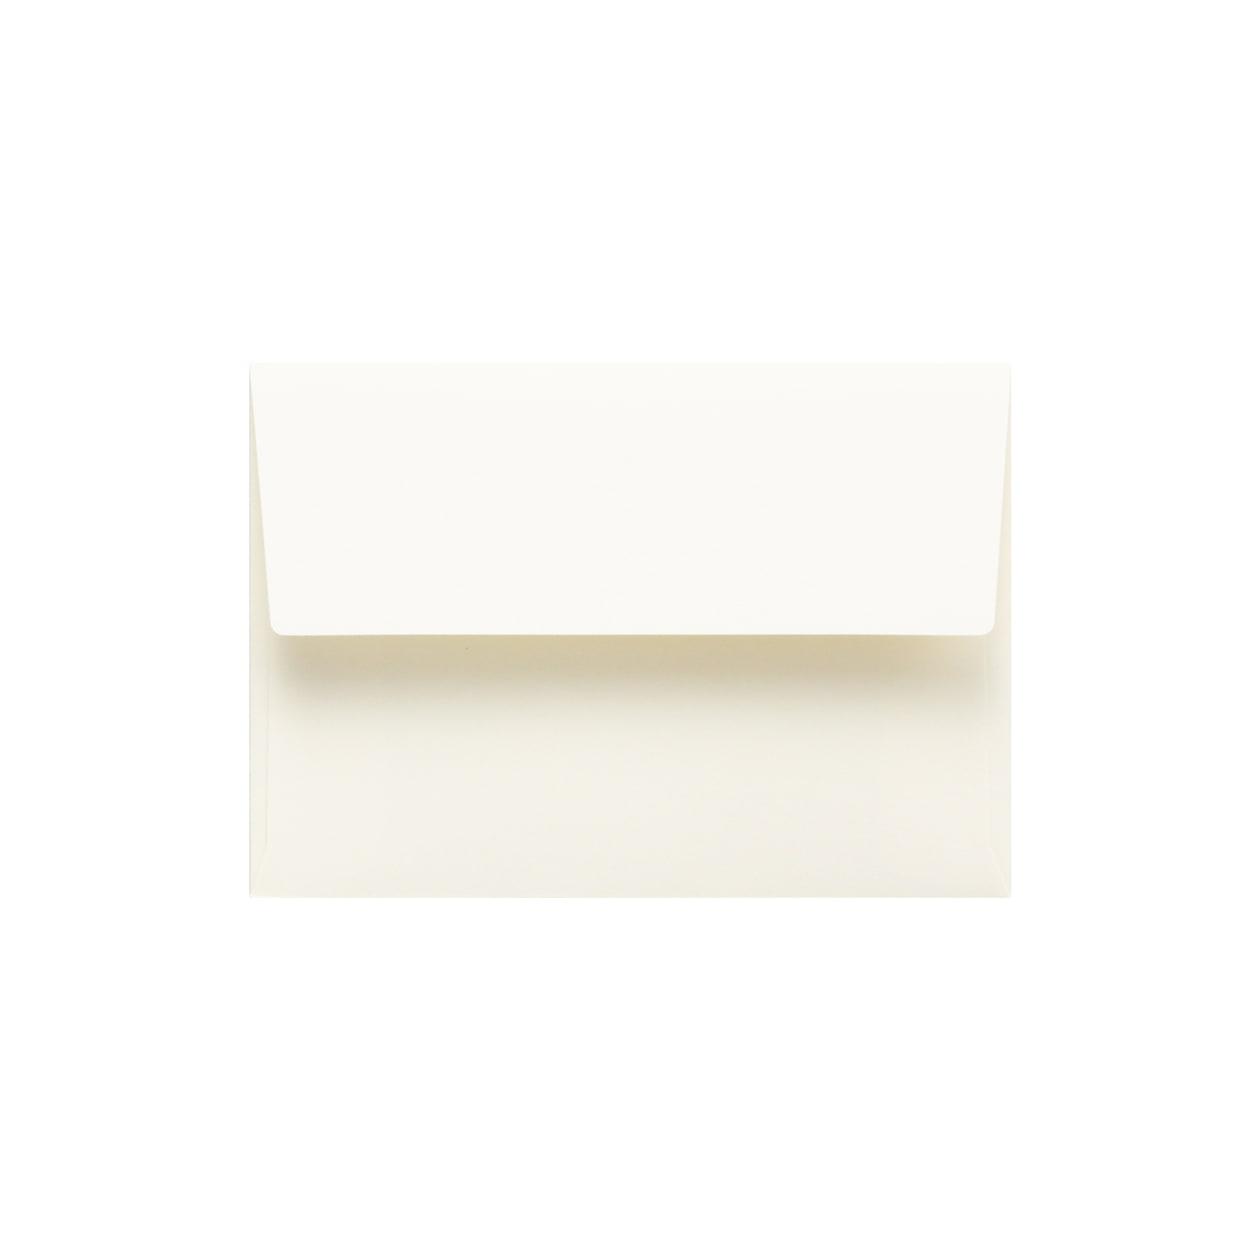 C7カマス封筒 HAGURUMA Basic ソフトクリーム 100g